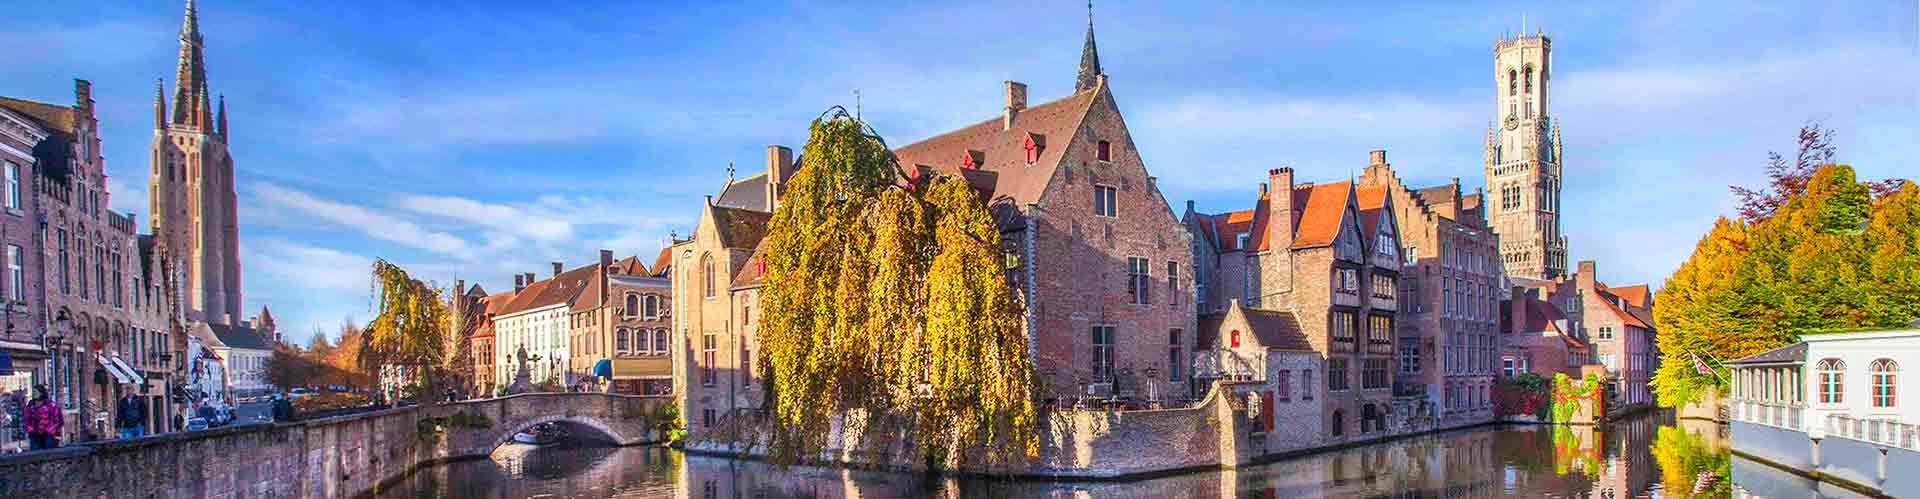 Free Tour Brujas - Turismo en Bélgica